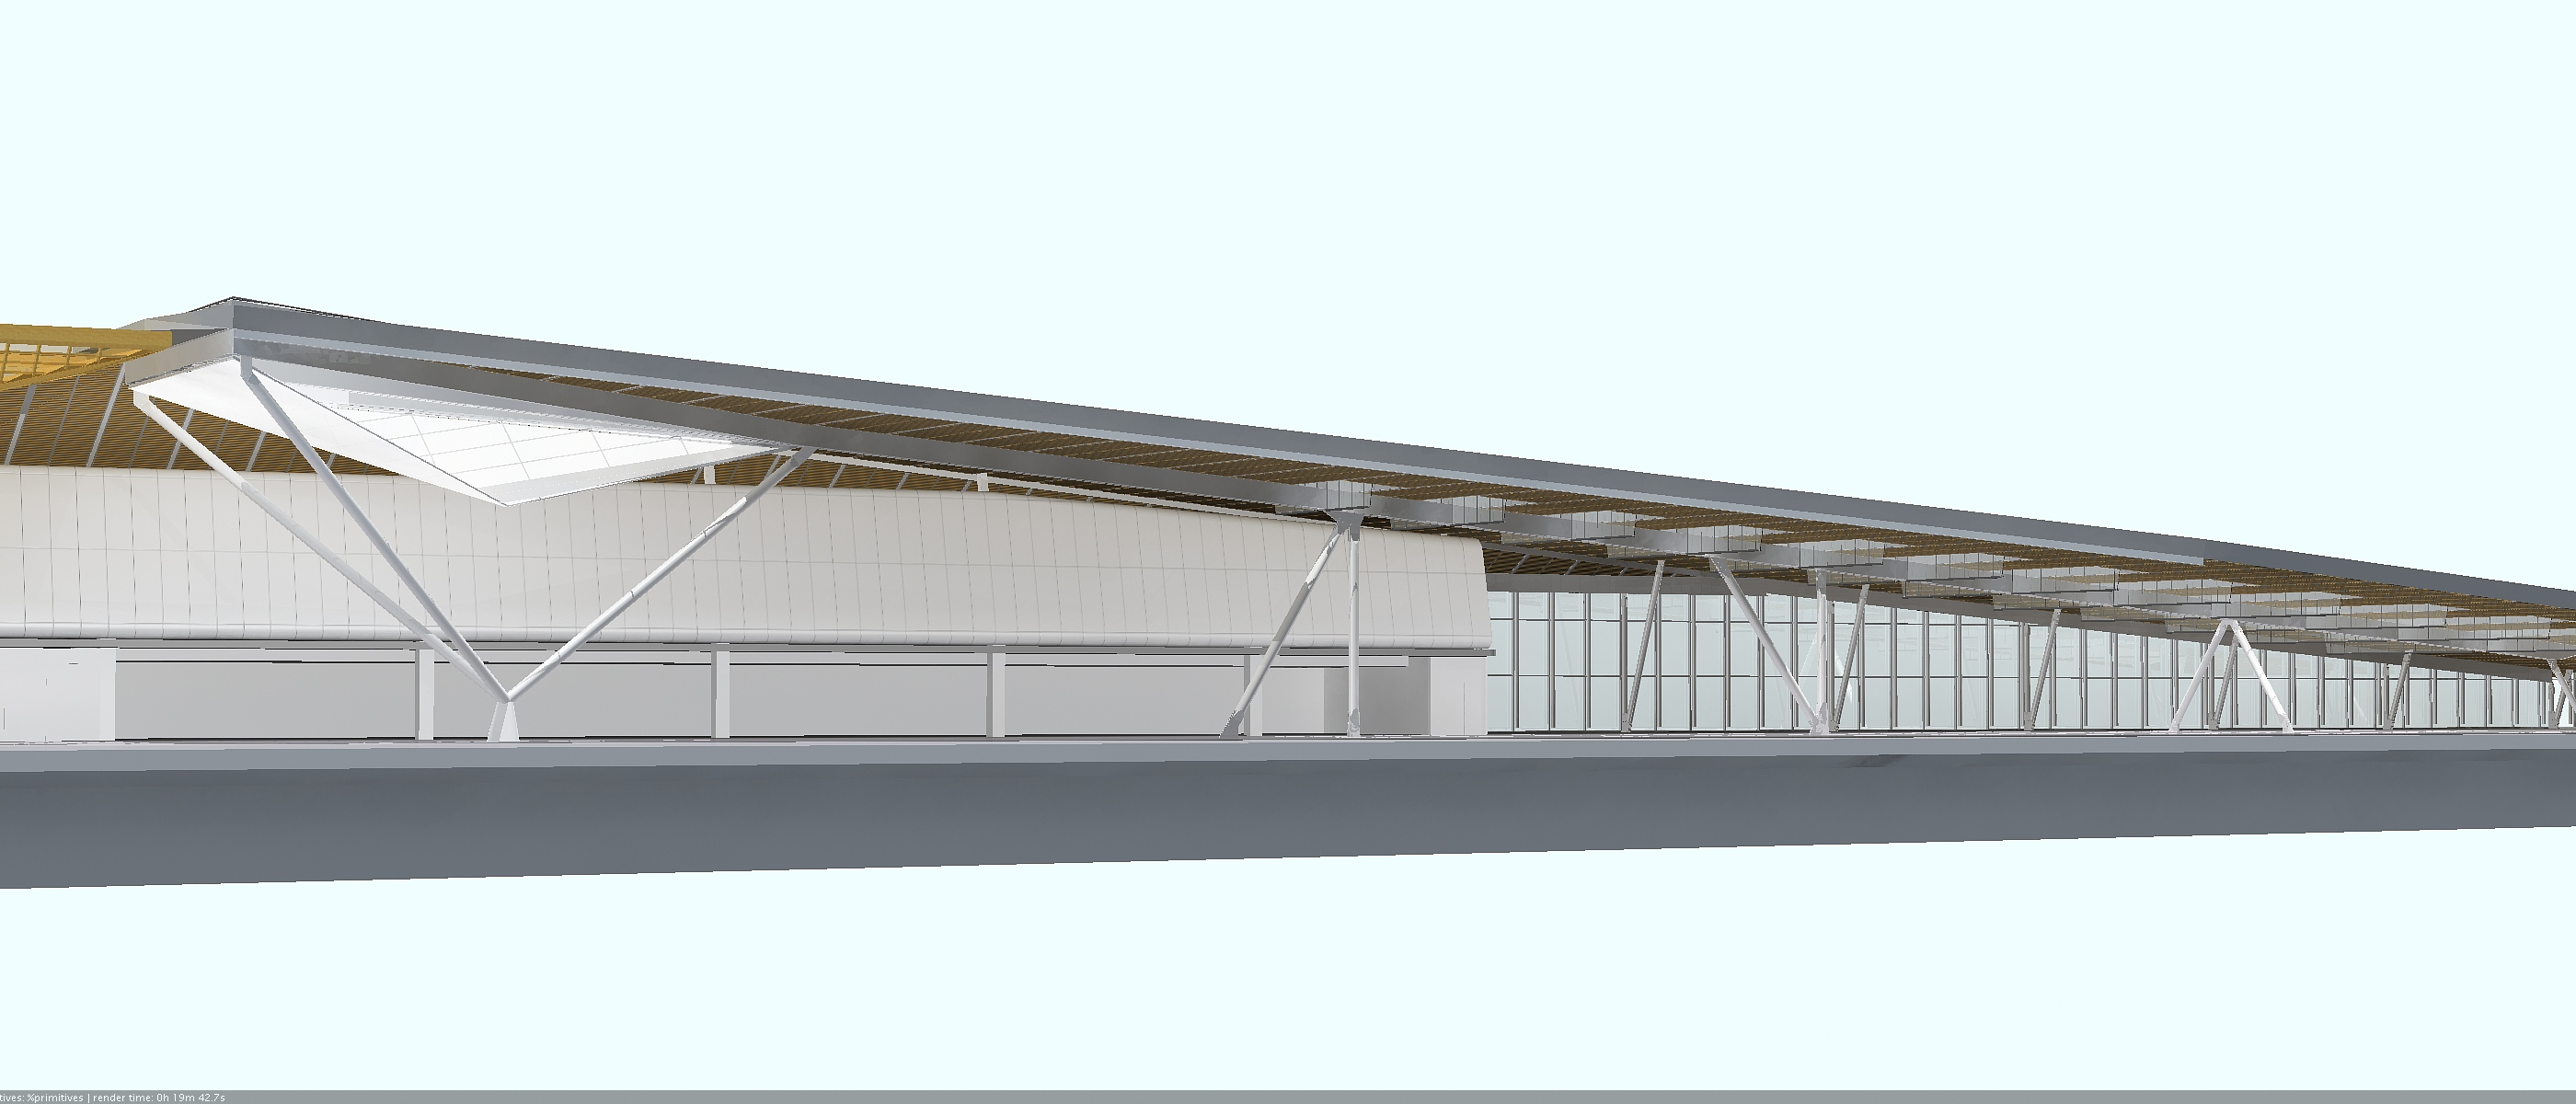 Midfield Concourse - 0214 - 0102603 - 02